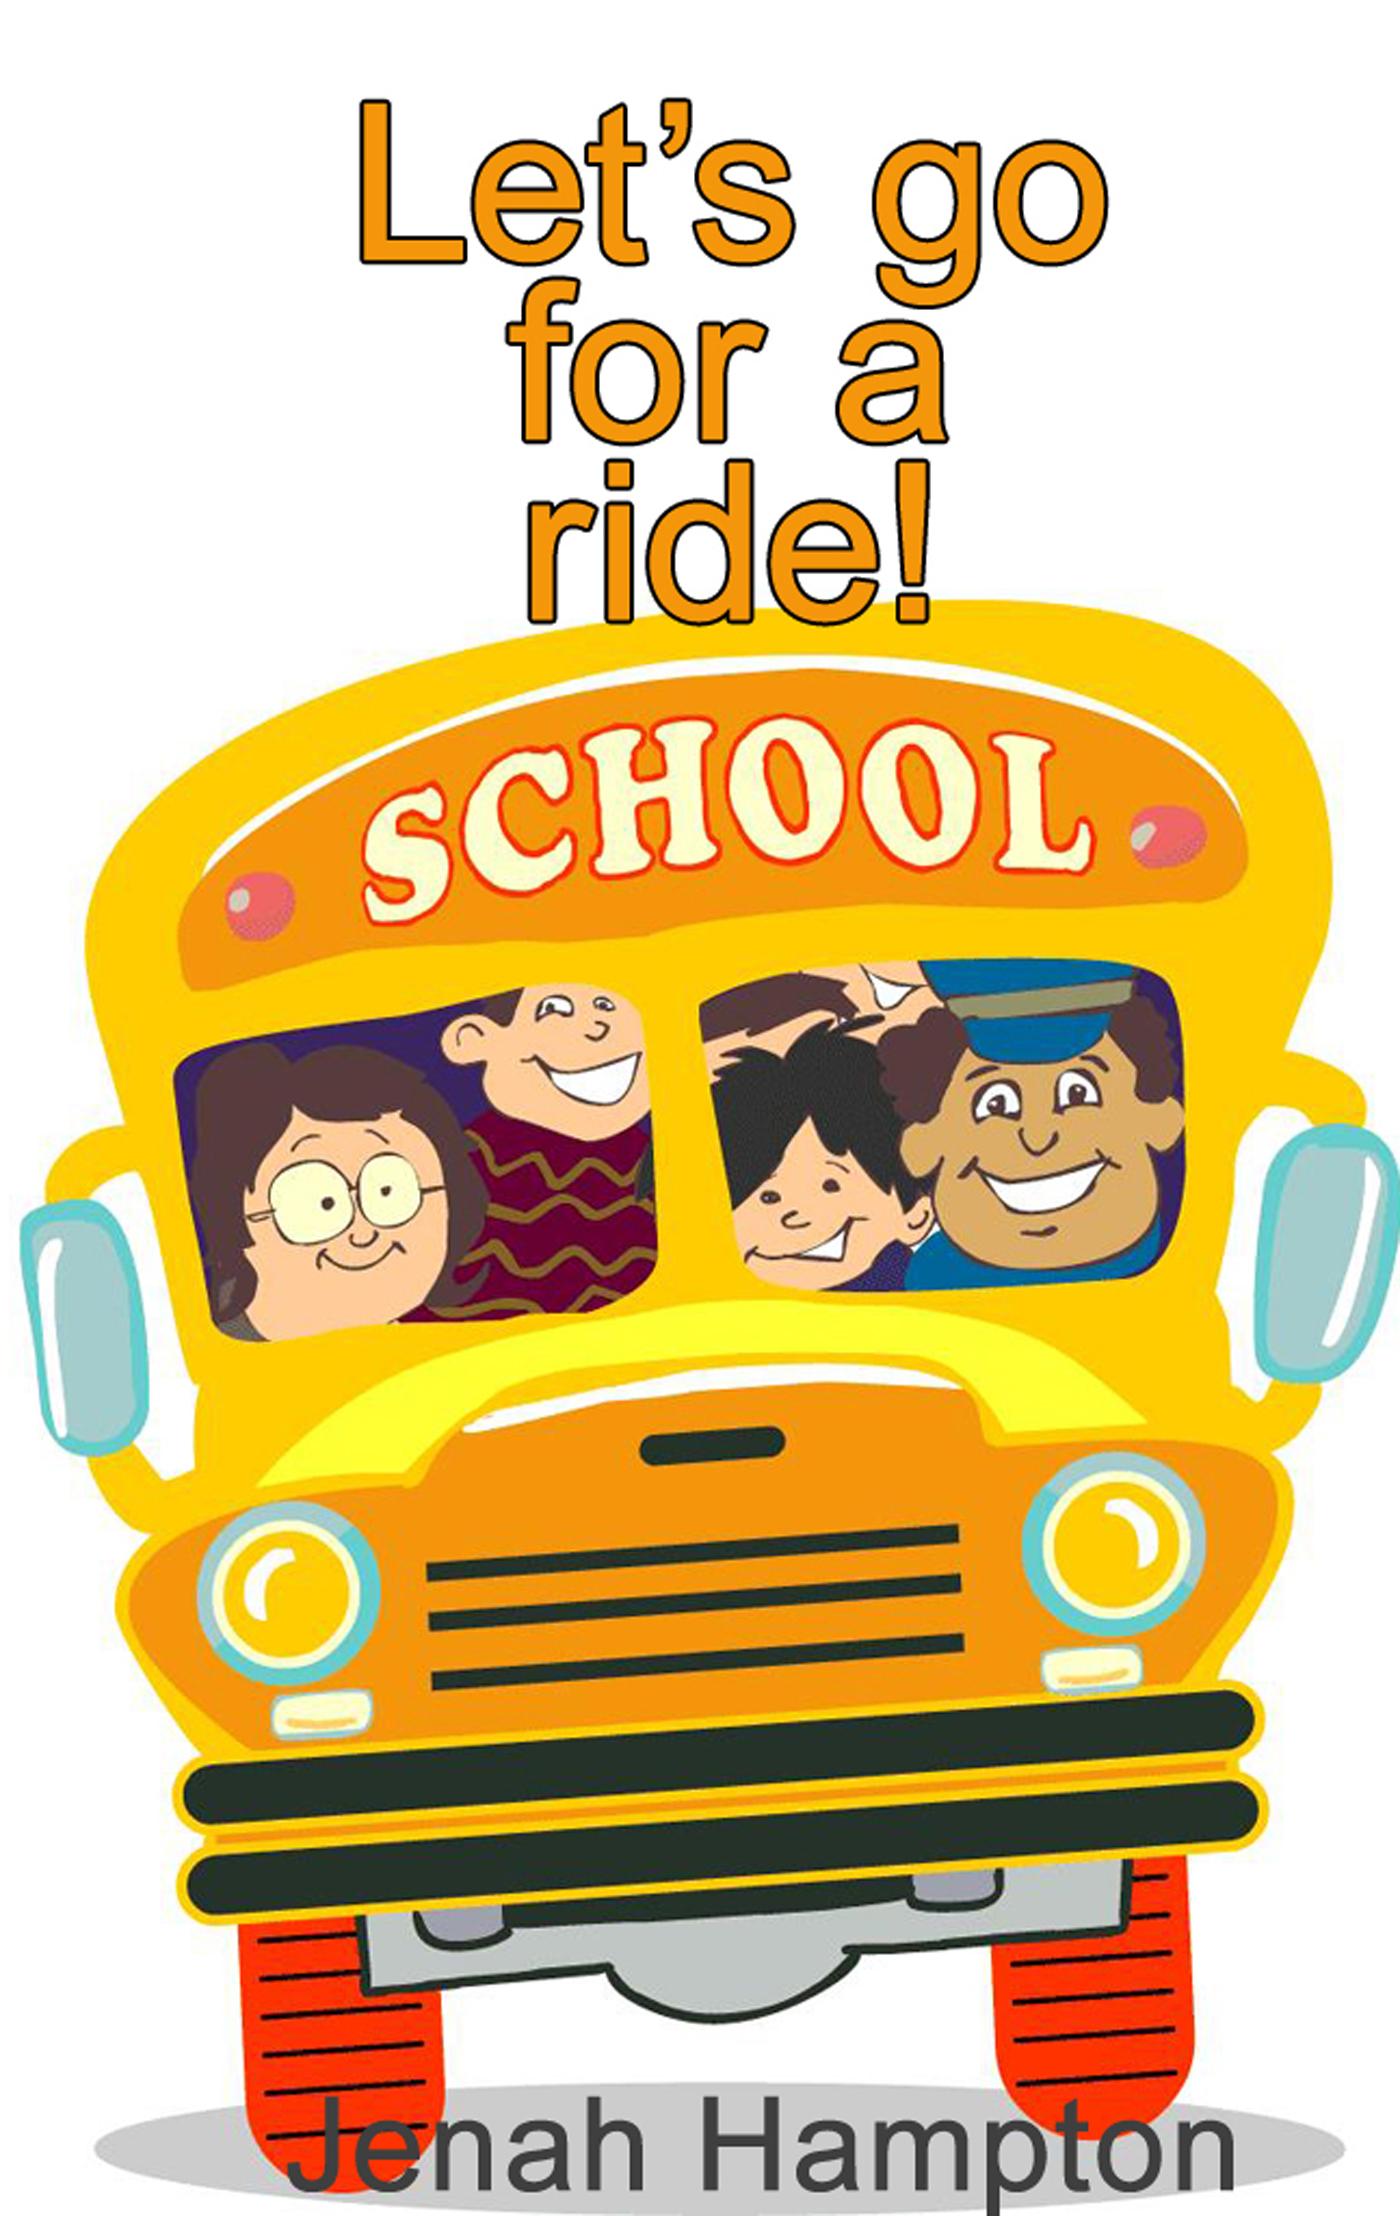 Jenah Hampton - Let's go for a ride